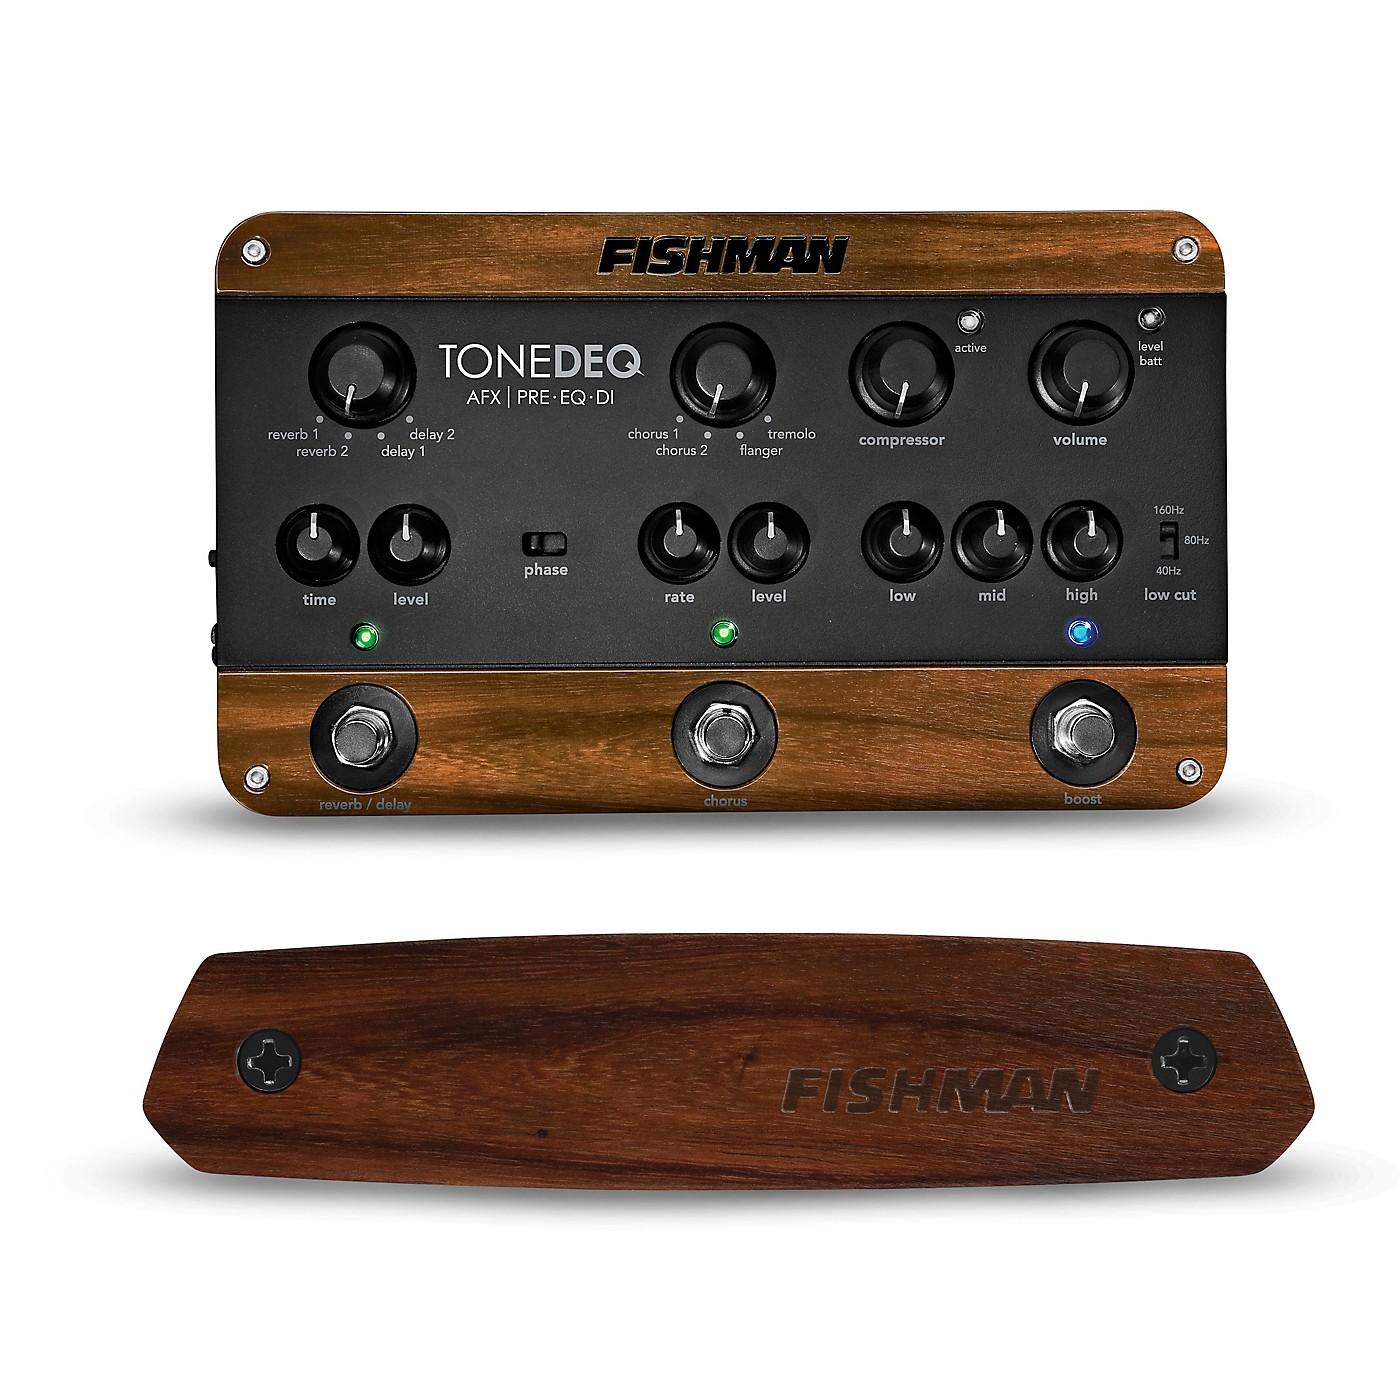 Fishman ToneDEQ Preamp EQ and Neo-D Passive Soundhole Guitar Pickup thumbnail